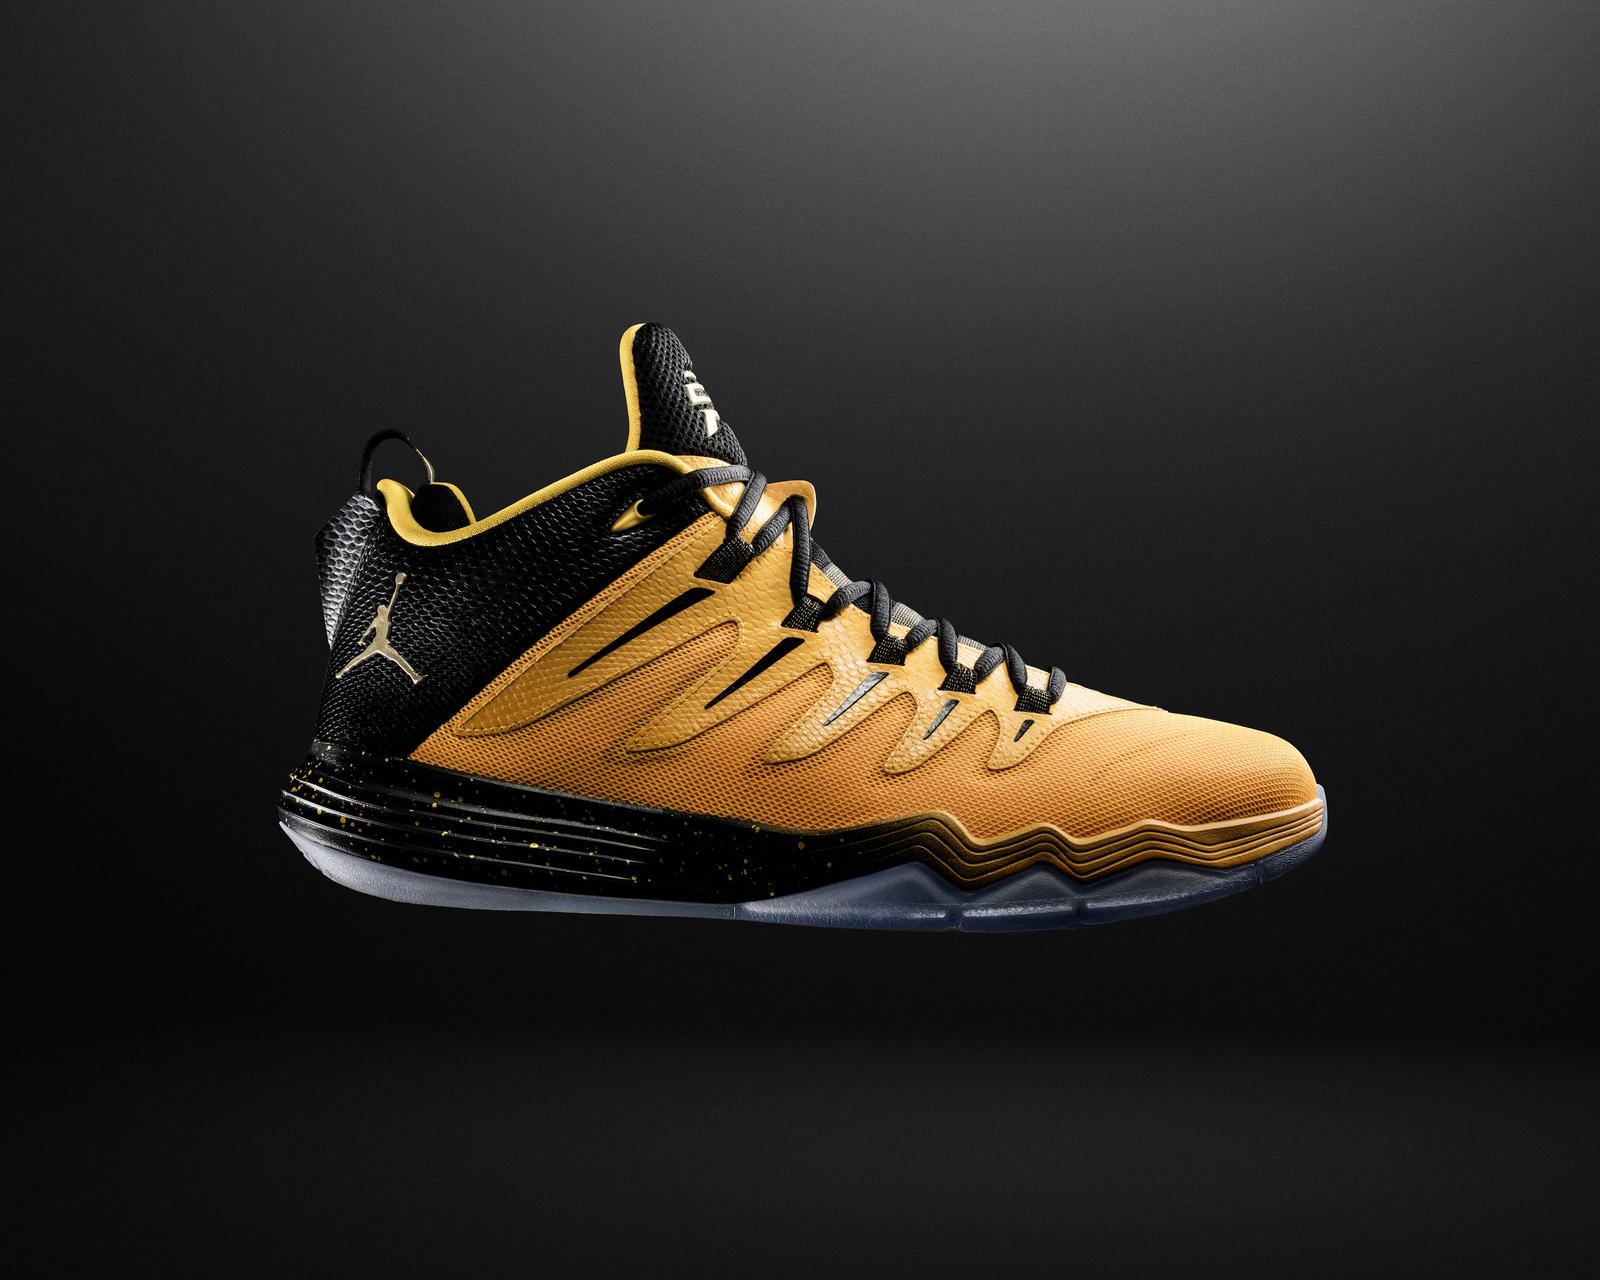 Jordan CP3.IX yellow dragon